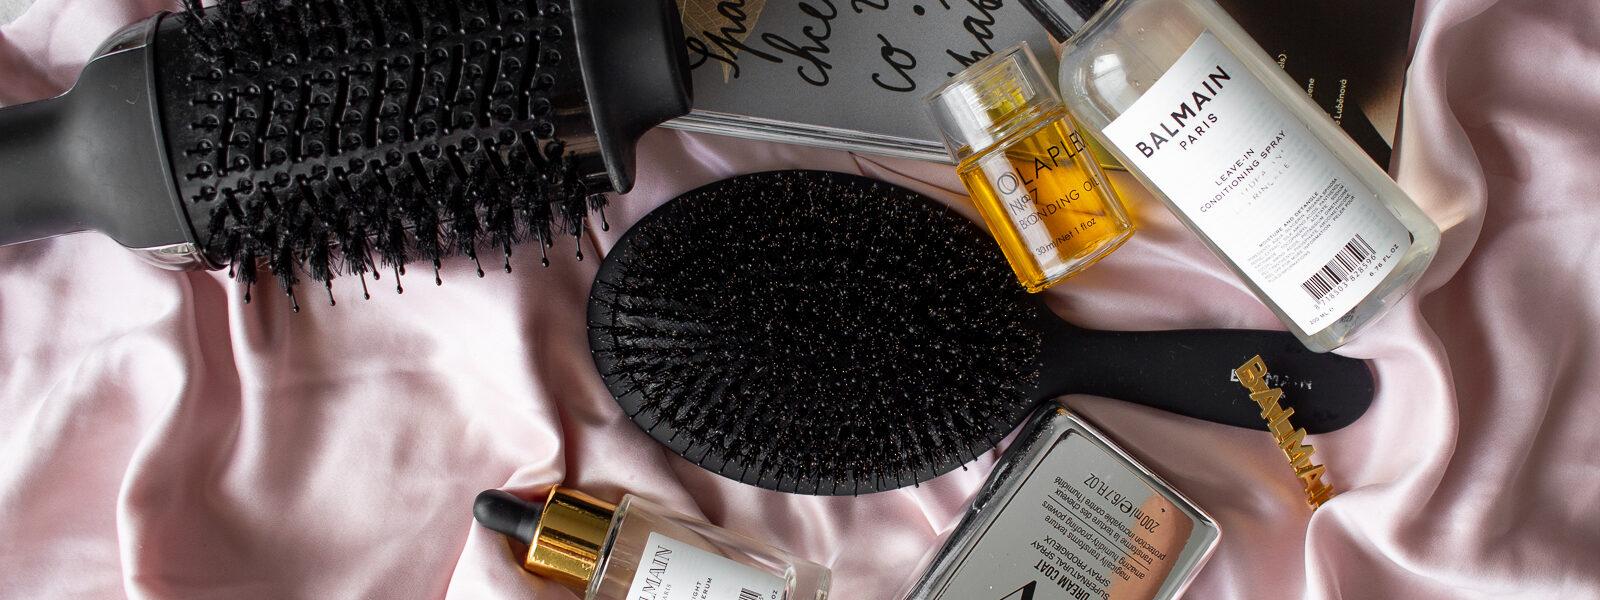 Top produkty na moje vlasy! || Hair care & tools 🖤